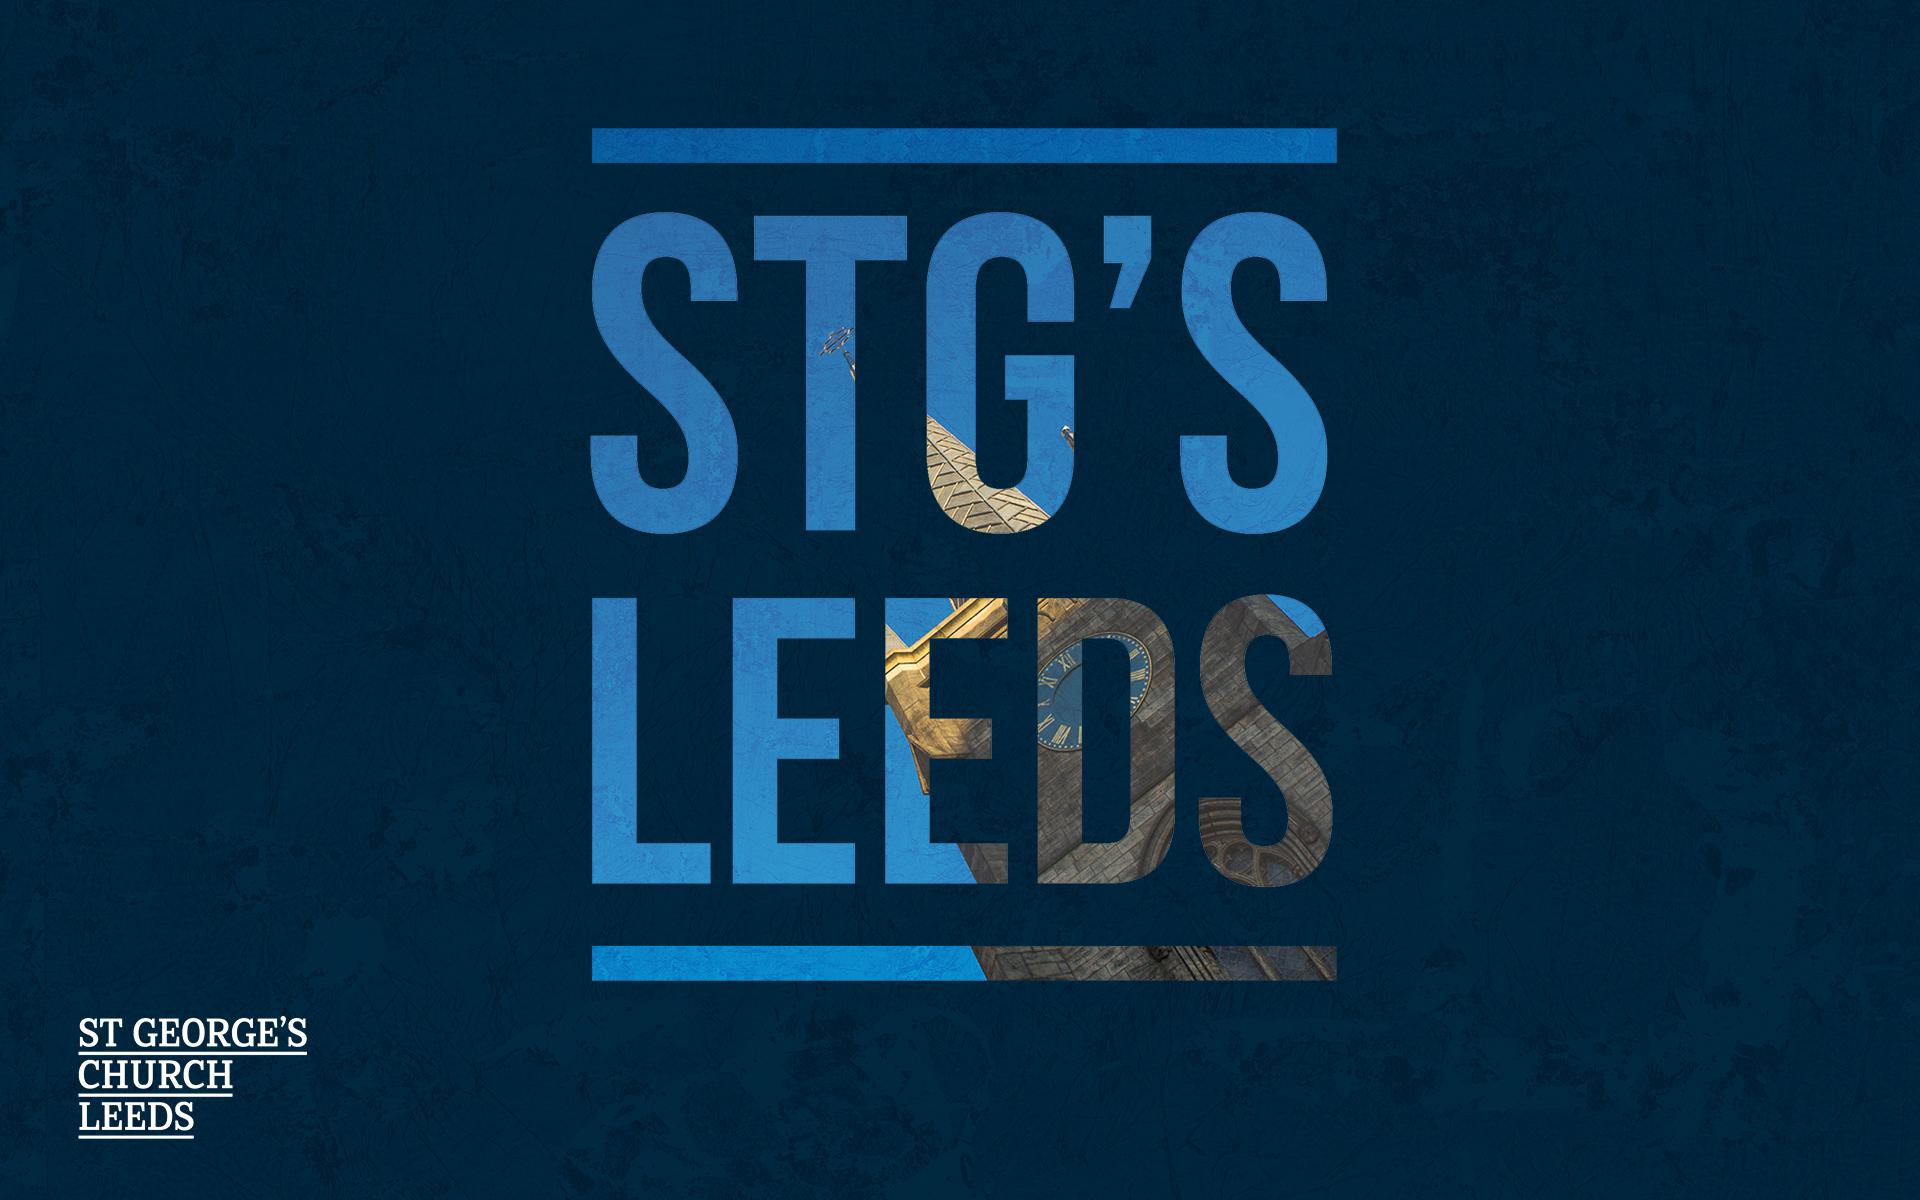 STGS Logo (textured).jpg